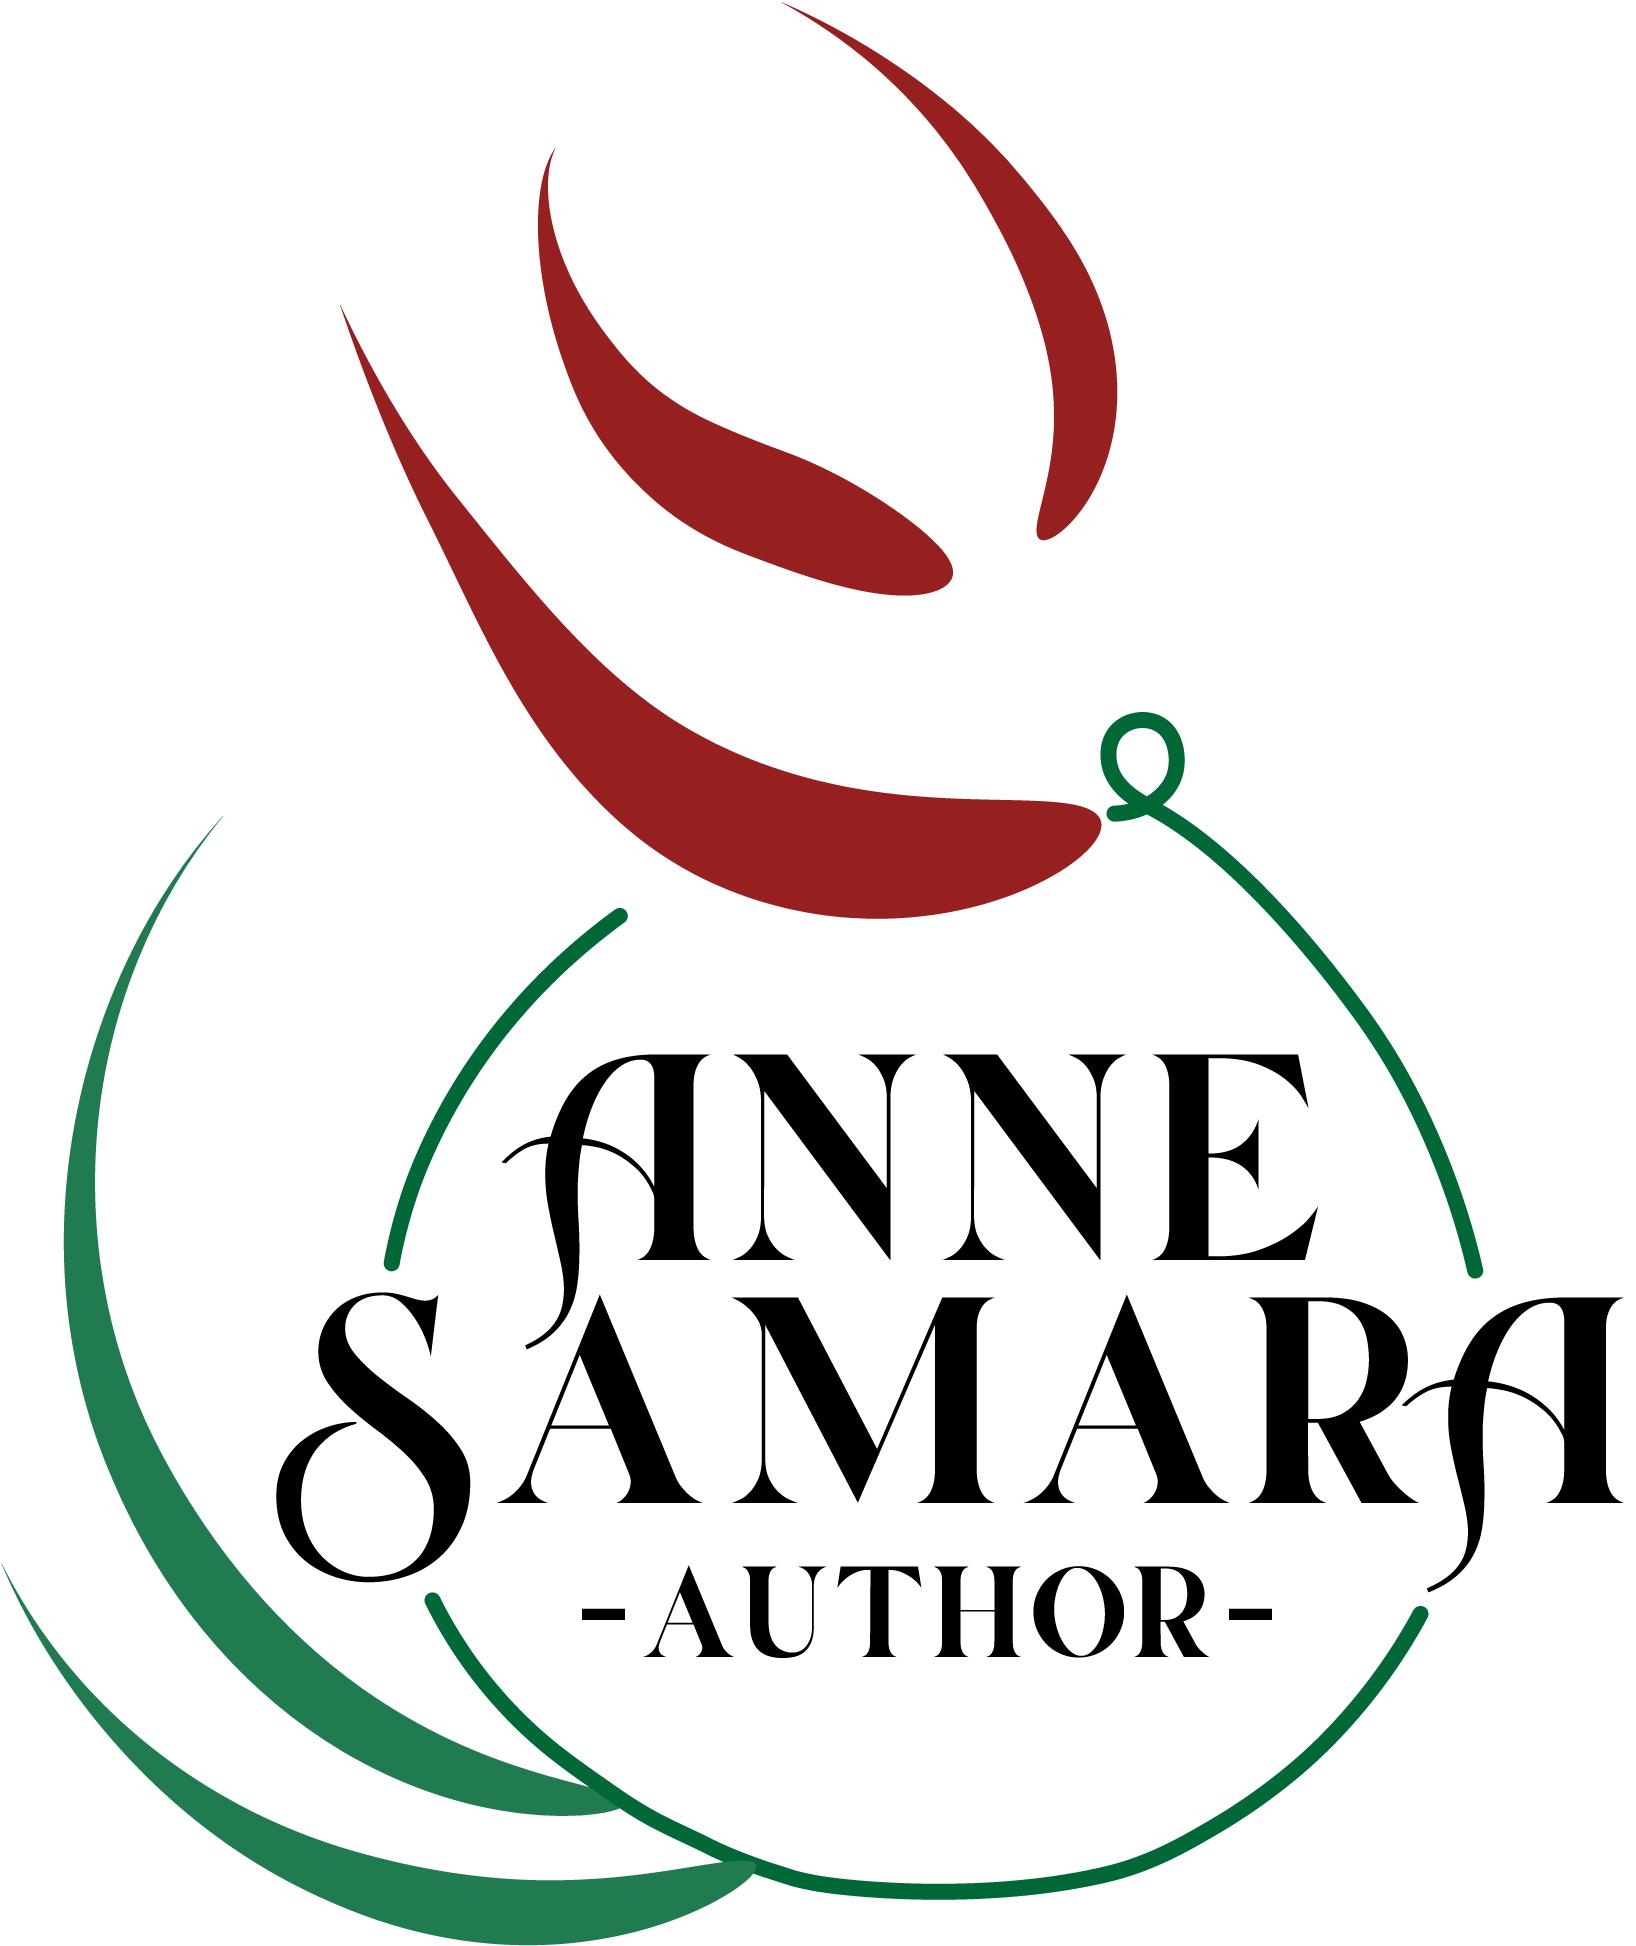 Author - Anne Samara